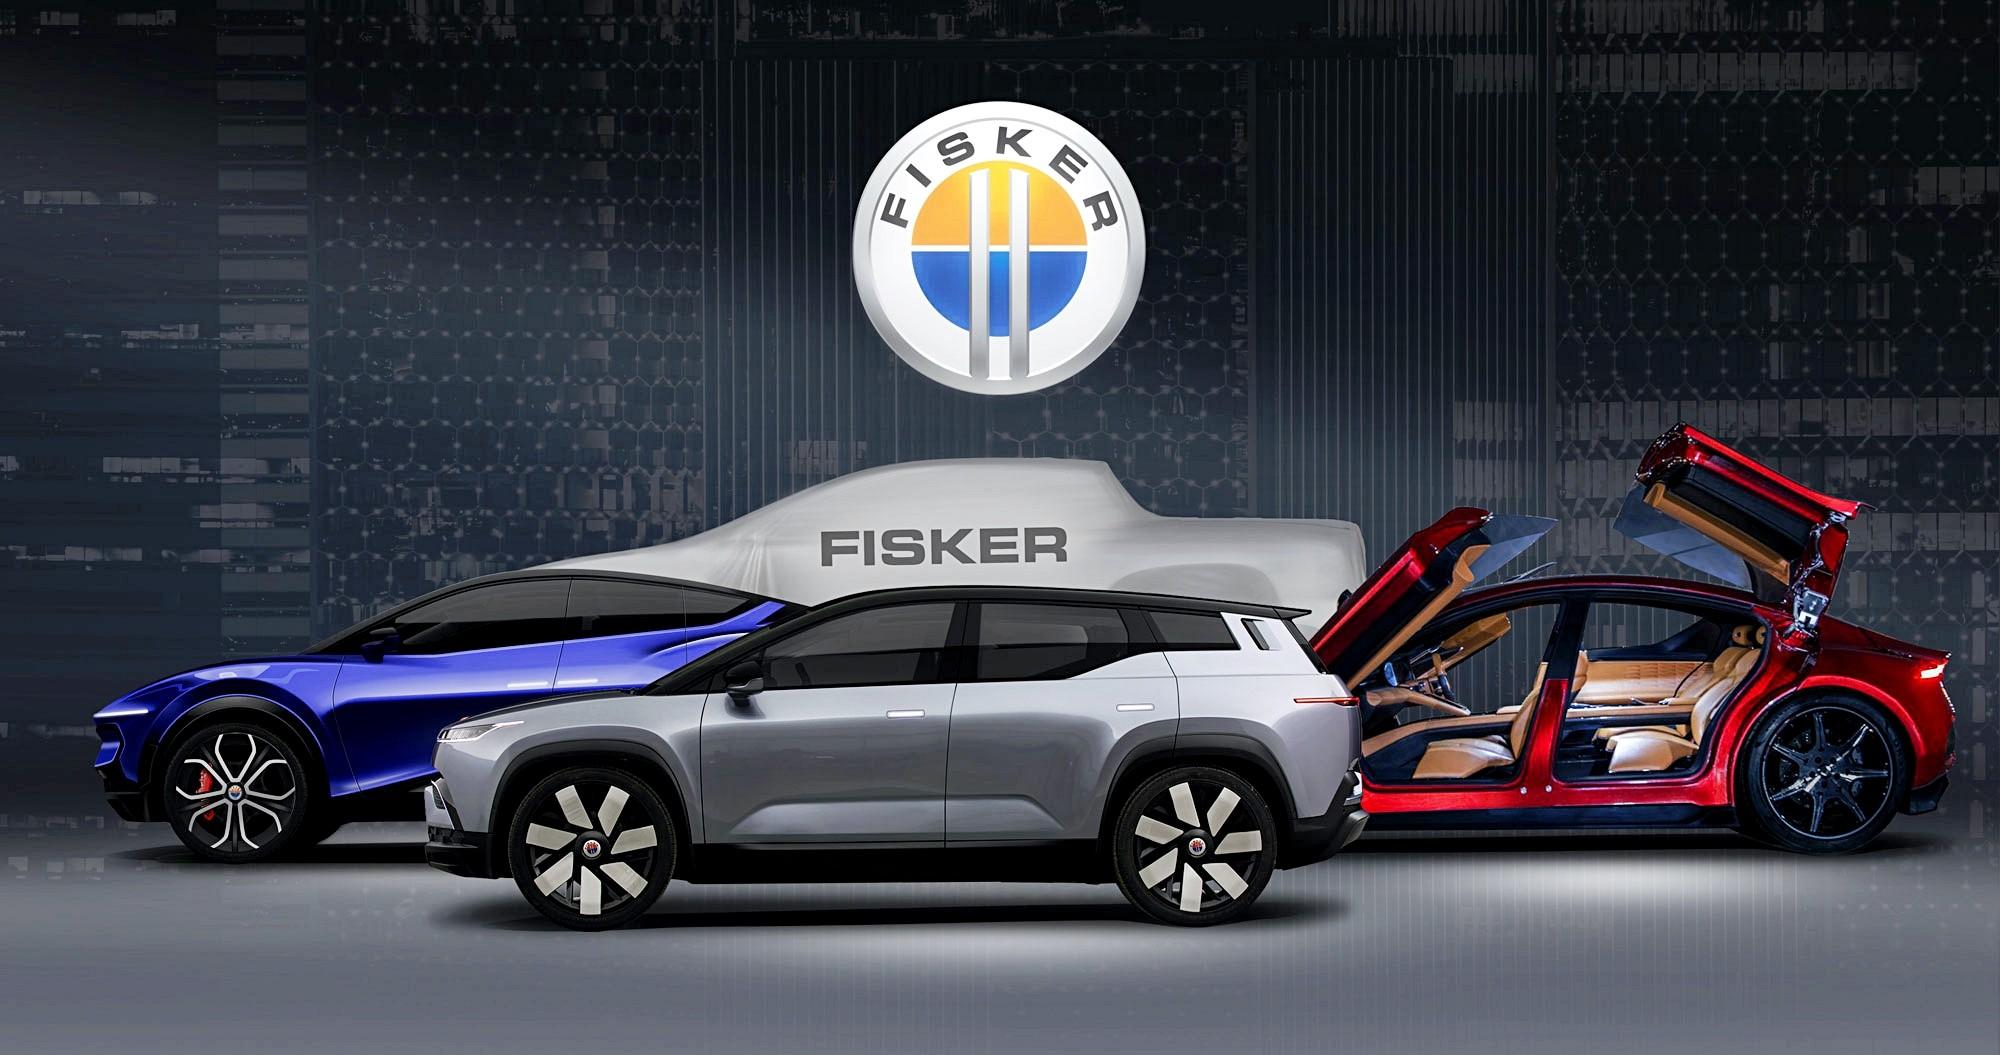 Fisker анонсировал три новинки (кросс-купе, седан, пикап) и партнёрство с VW